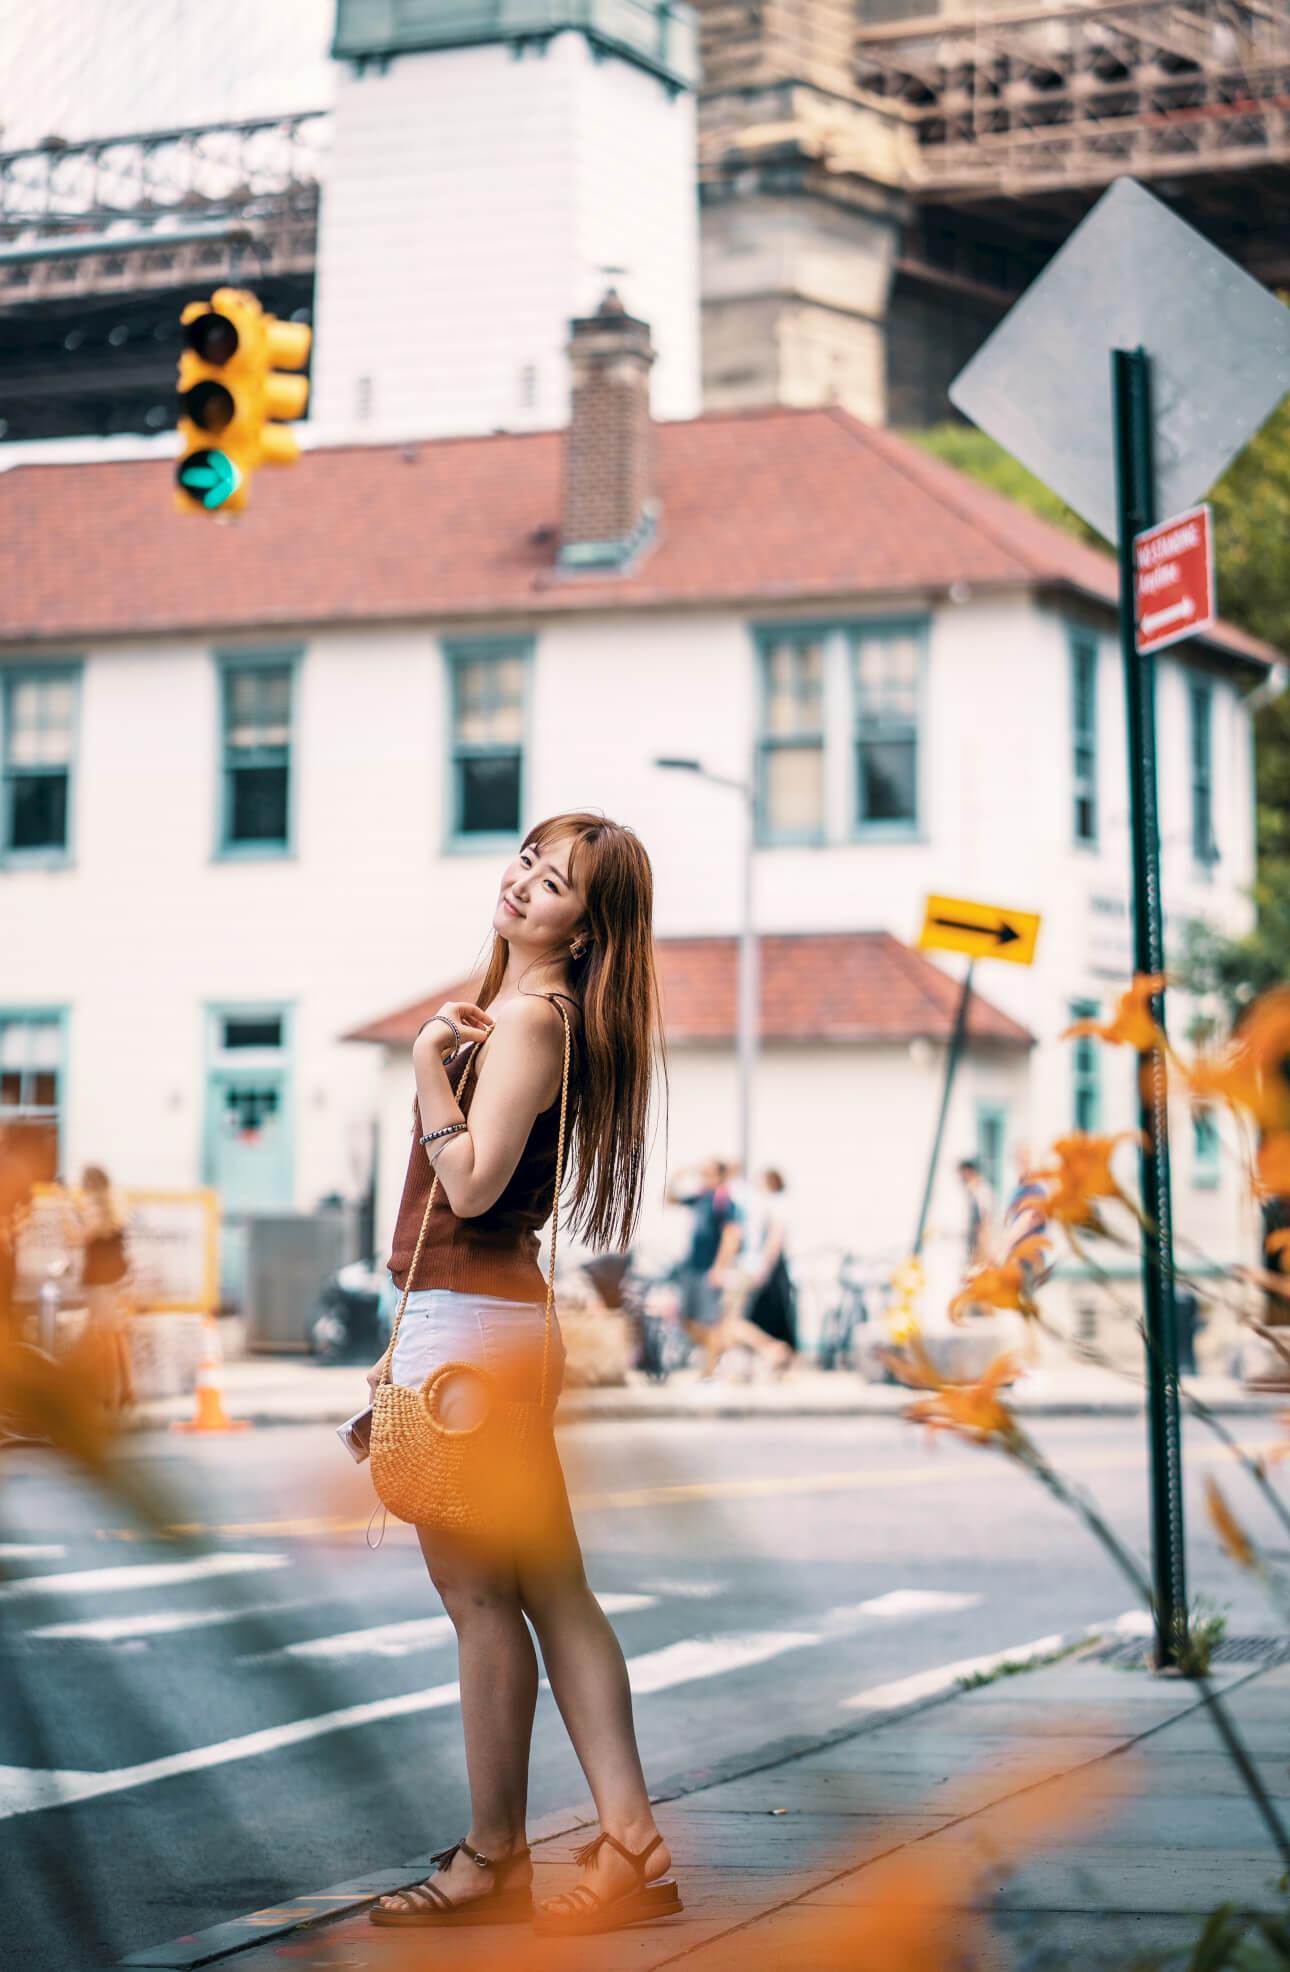 Sprazzi_Professional_Portrait_Photo_NYC_Uk_Original_7.jpg